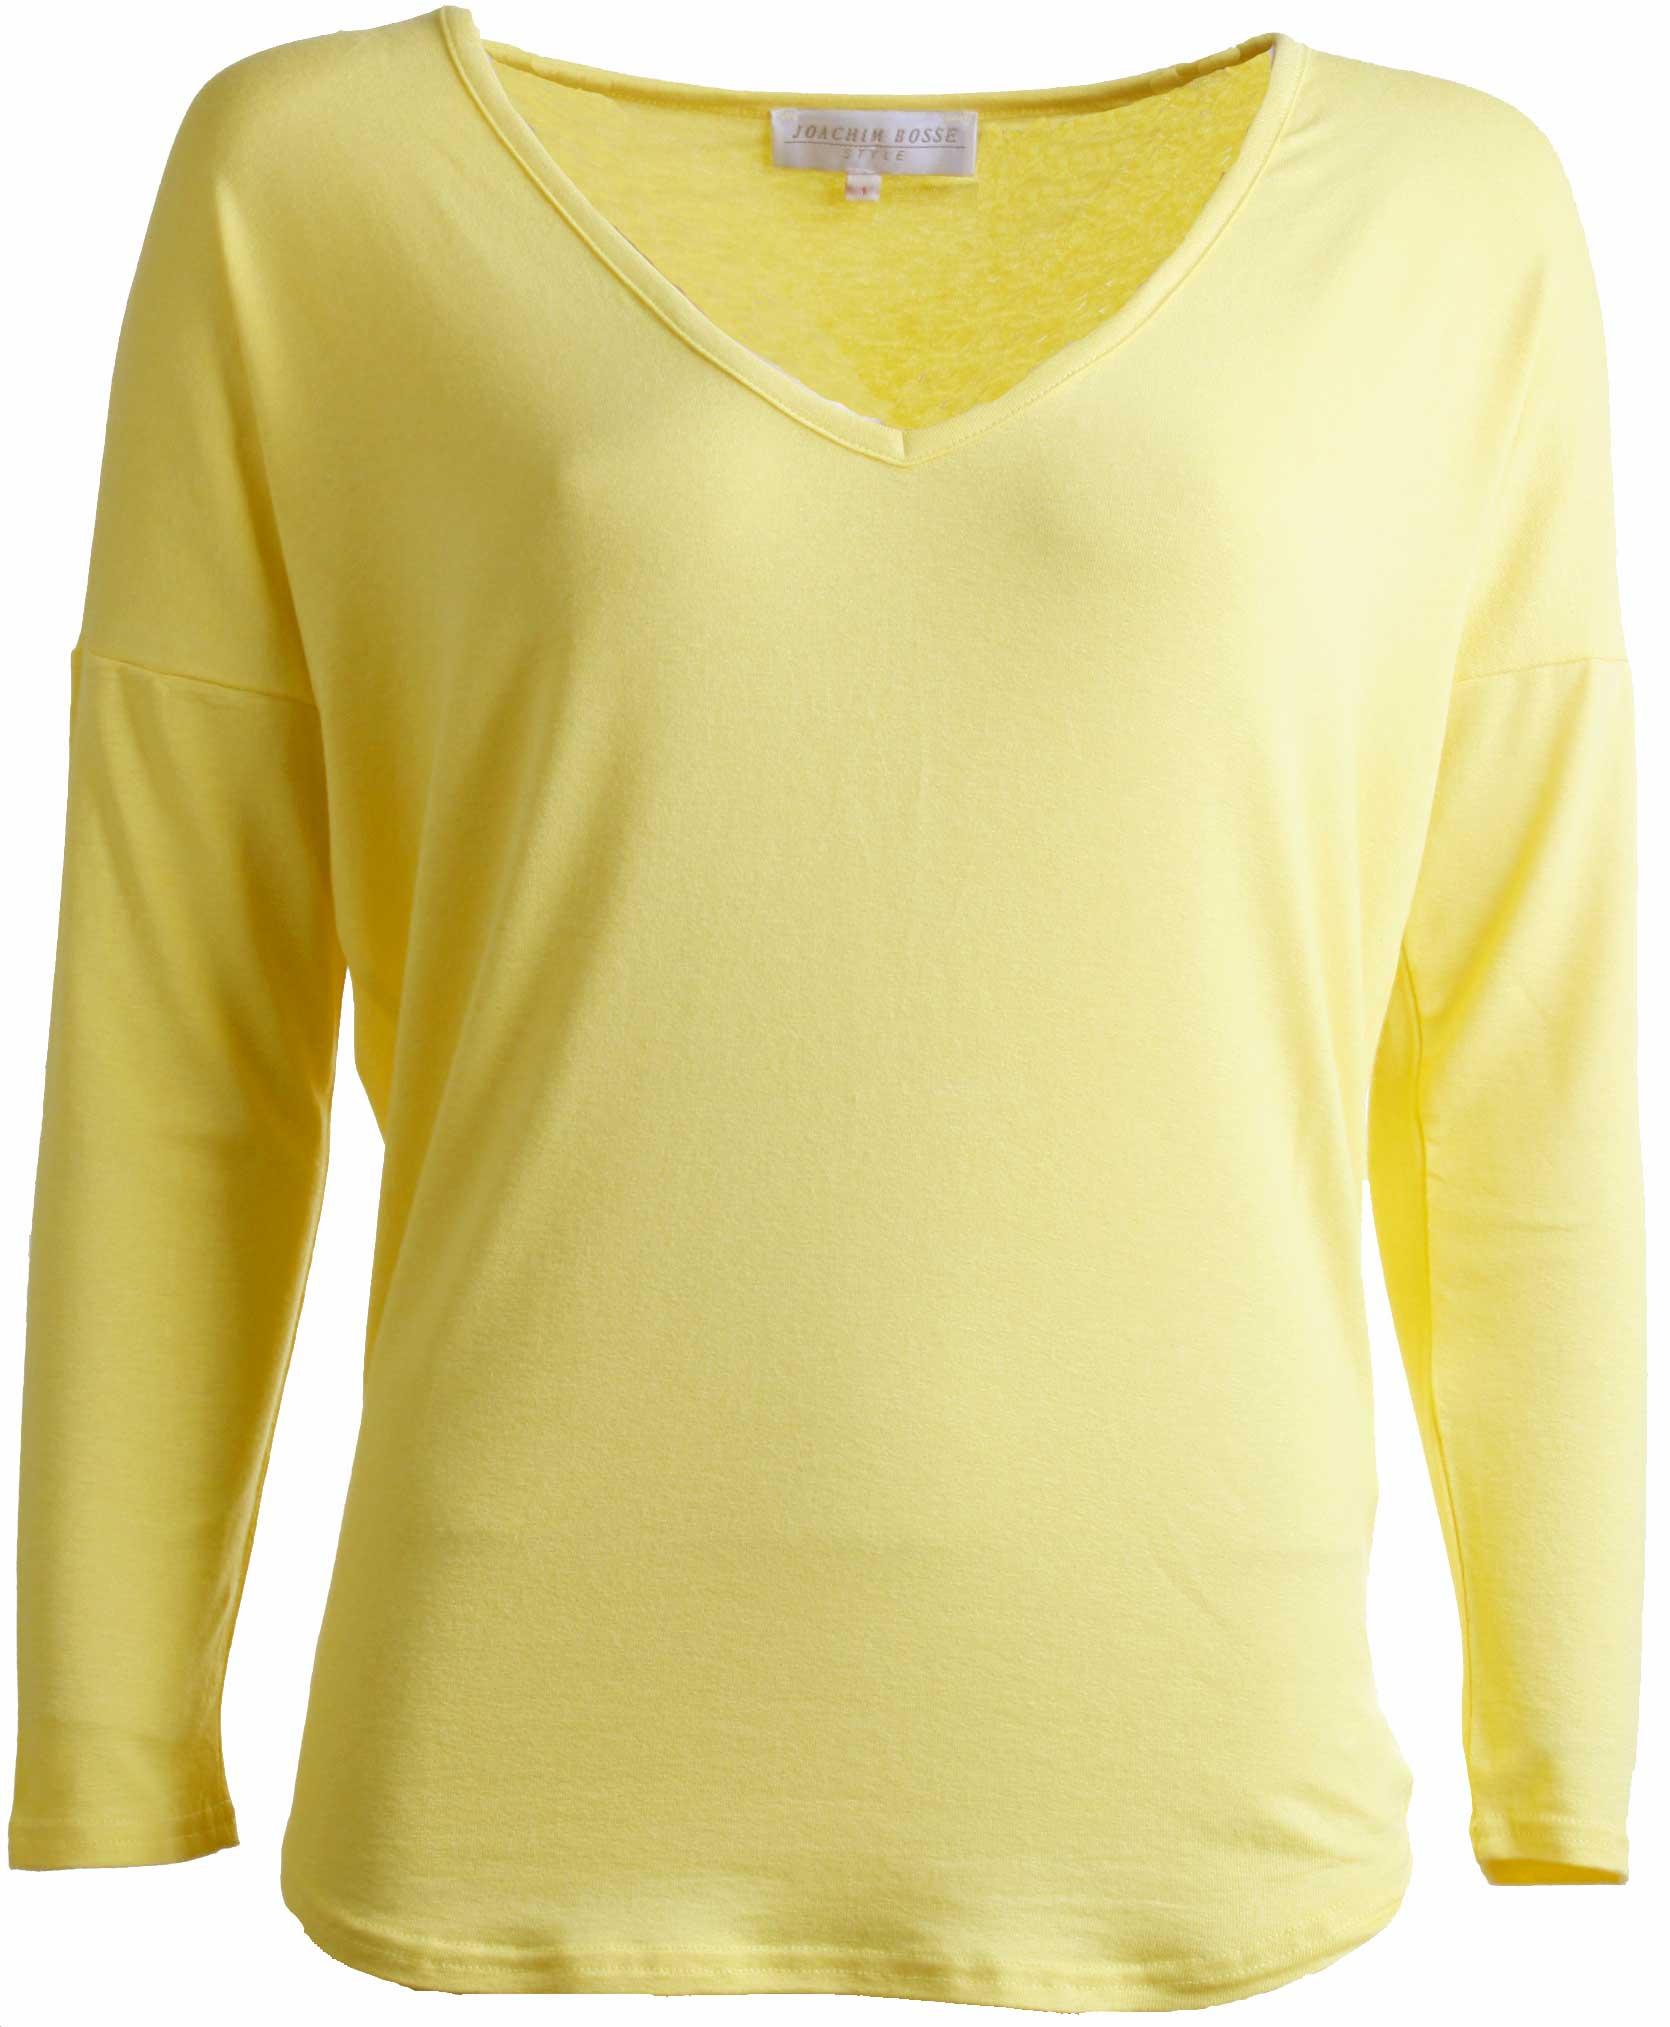 Shirt JOLLY Yellow1